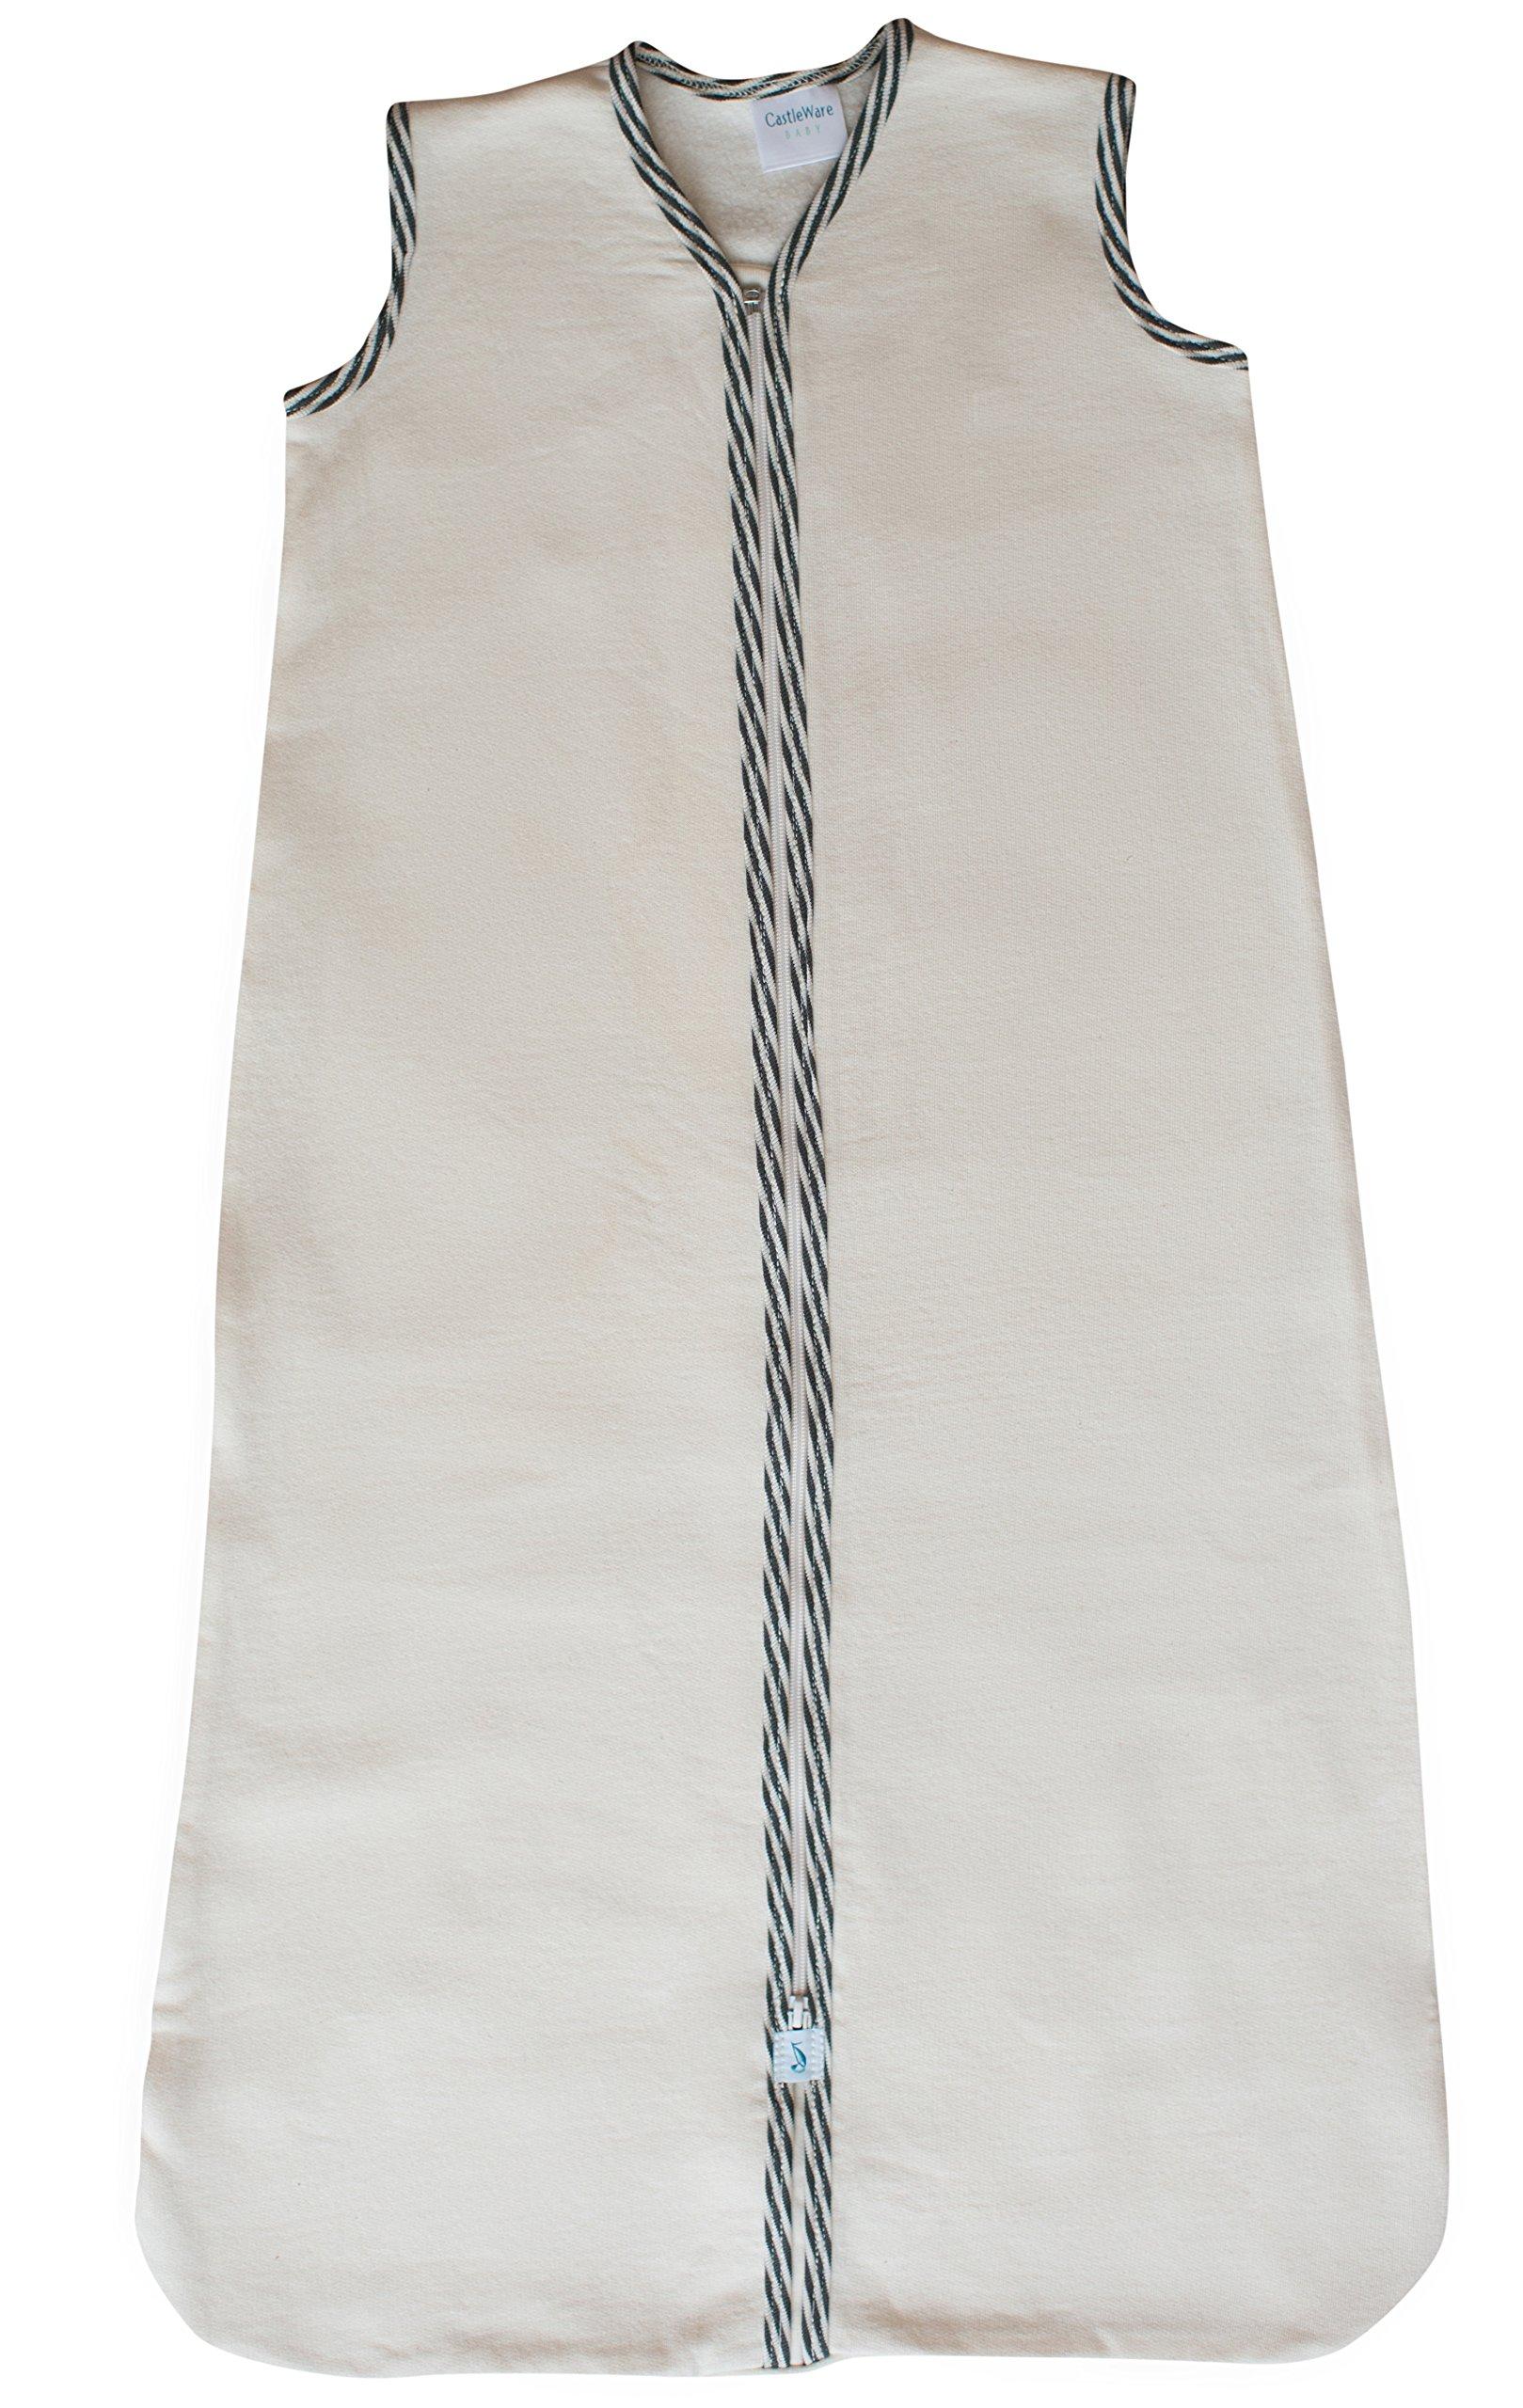 CastleWare Baby Sleeveless Fleece Sleeper Bag (XXL 18-36 Months, Charcoal Grey Stripe) by CastleWare Baby